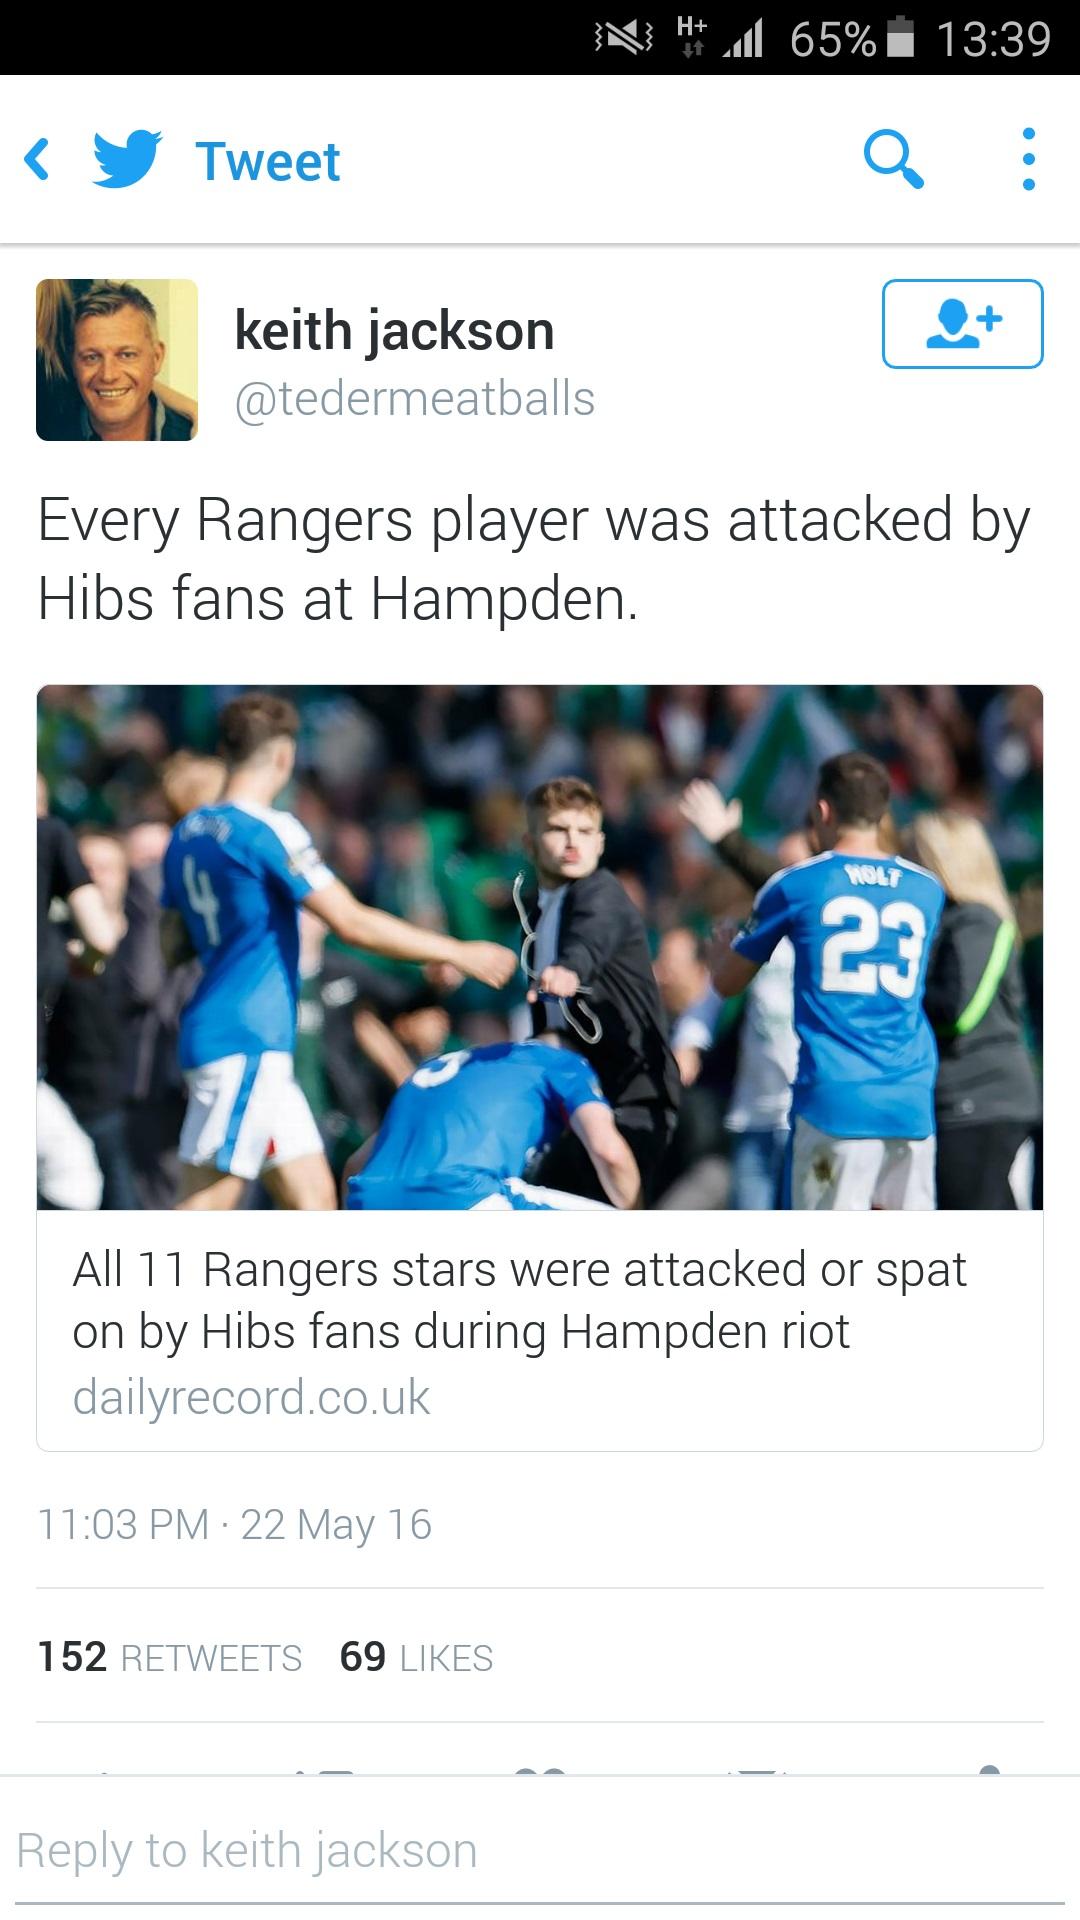 Keith Jackson Tweet_every player assaulted Screenshot_2016-05-23-13-39-51